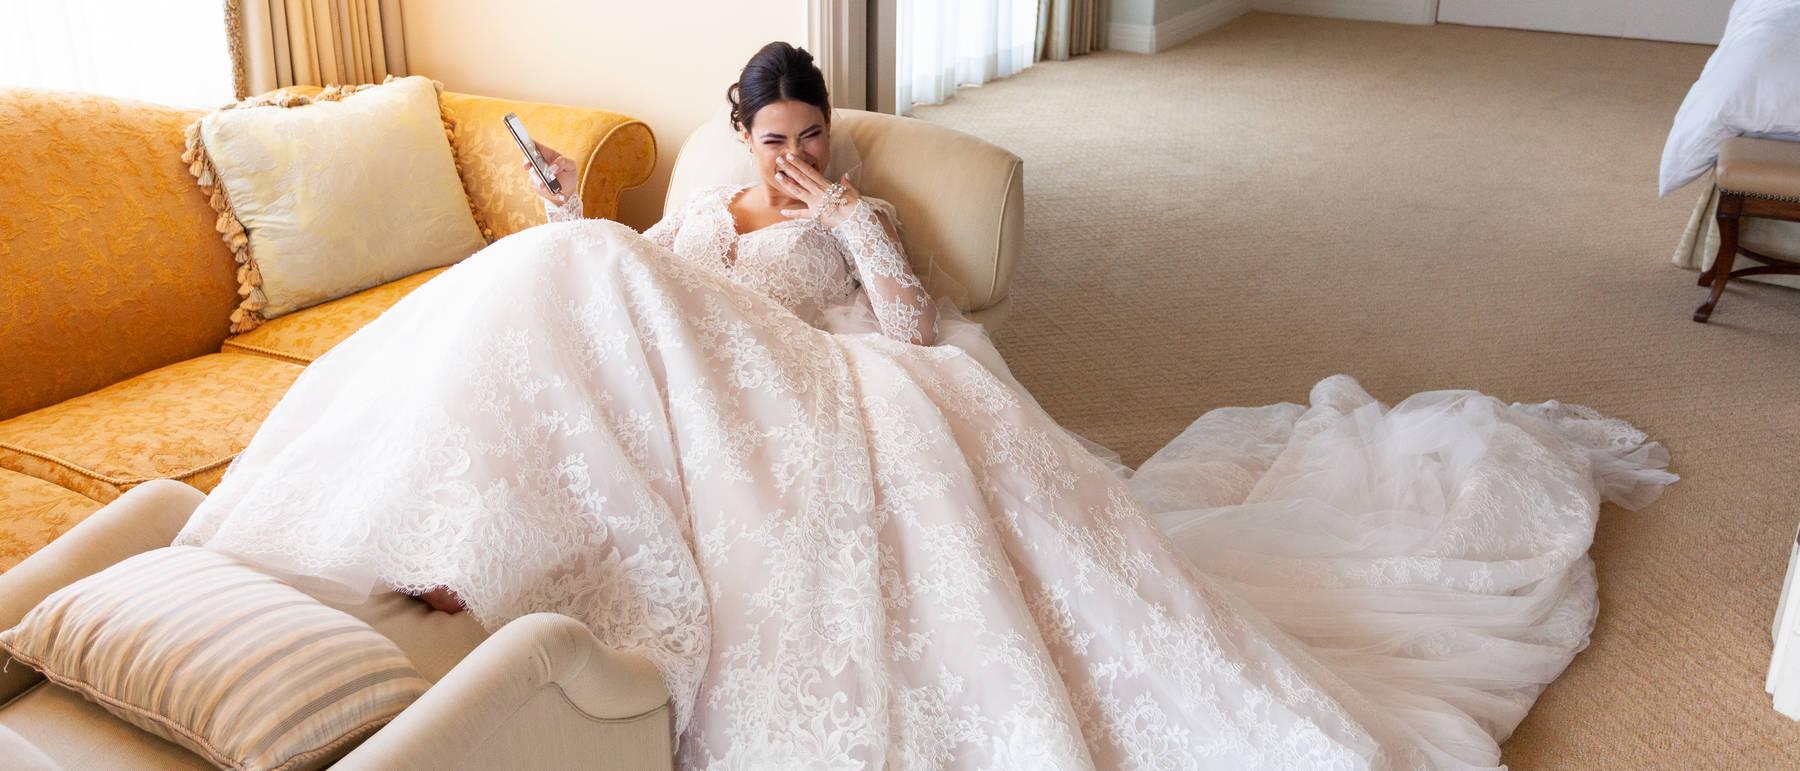 johnandjoseph-wedding-photographer-hz-slider-347